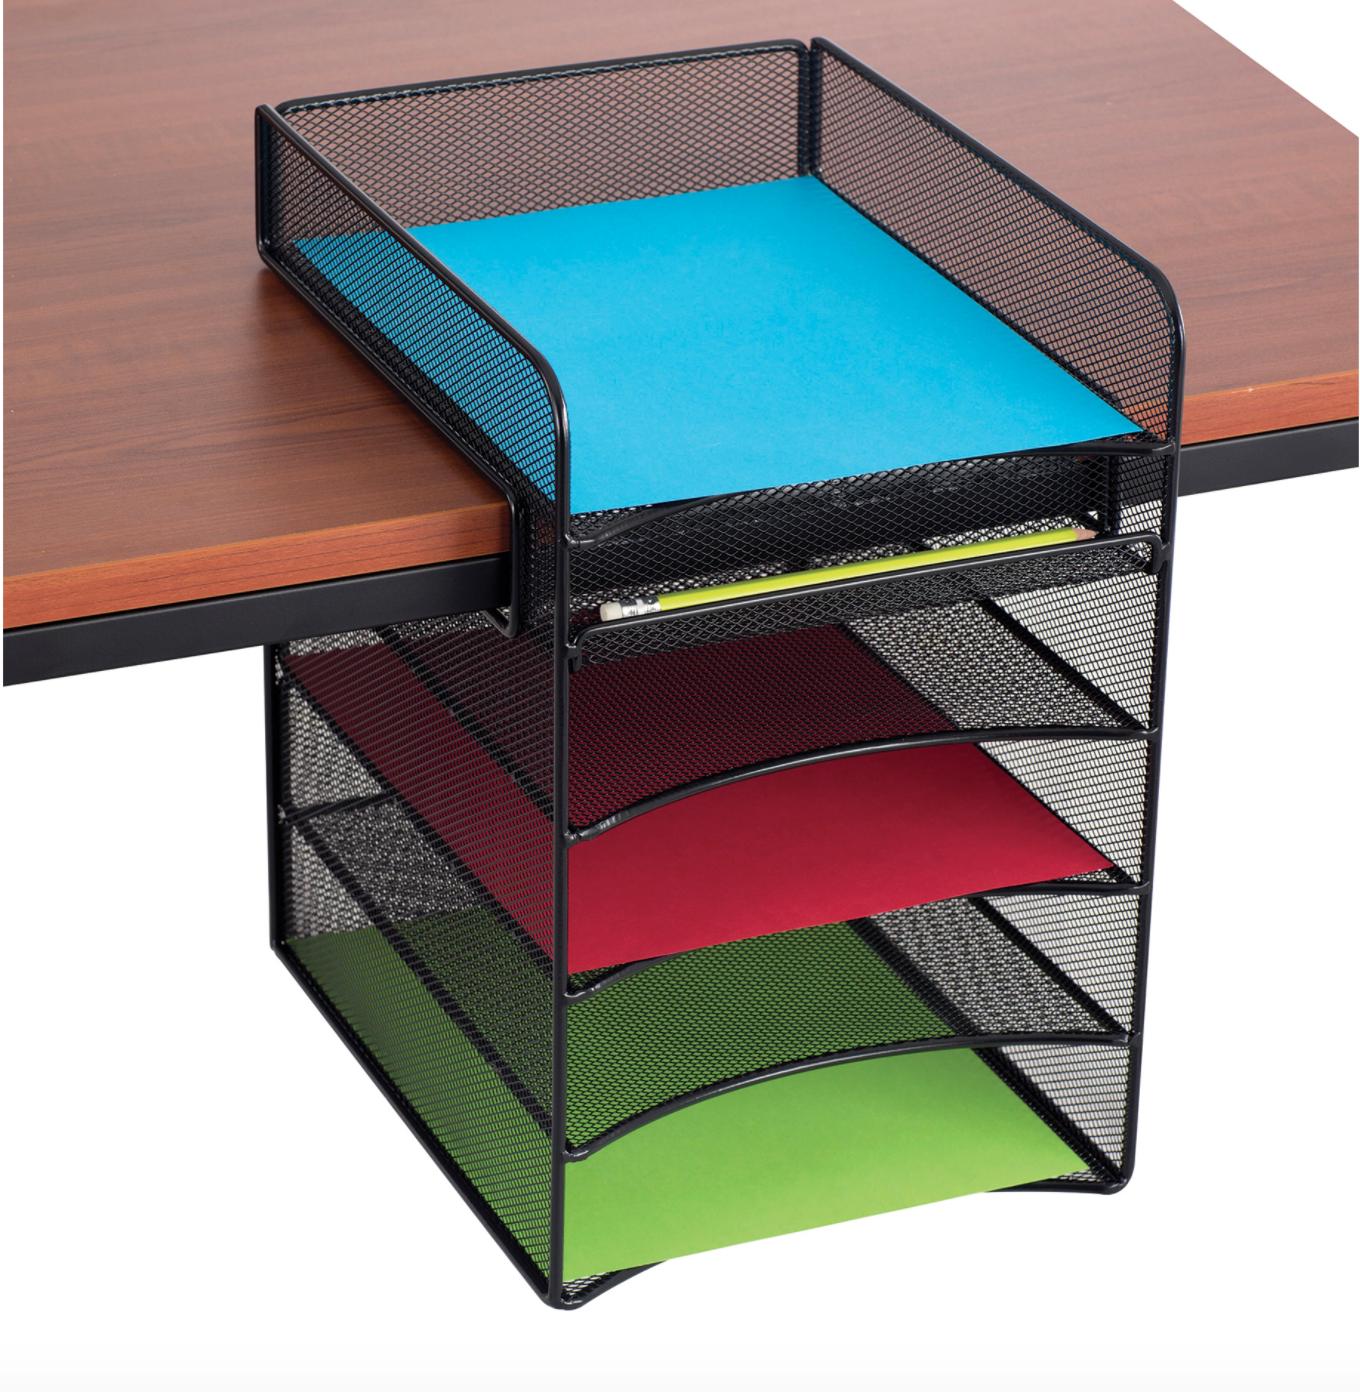 proyectolandolina office desk accessories online shopping india rh proyectolandolina blogspot com